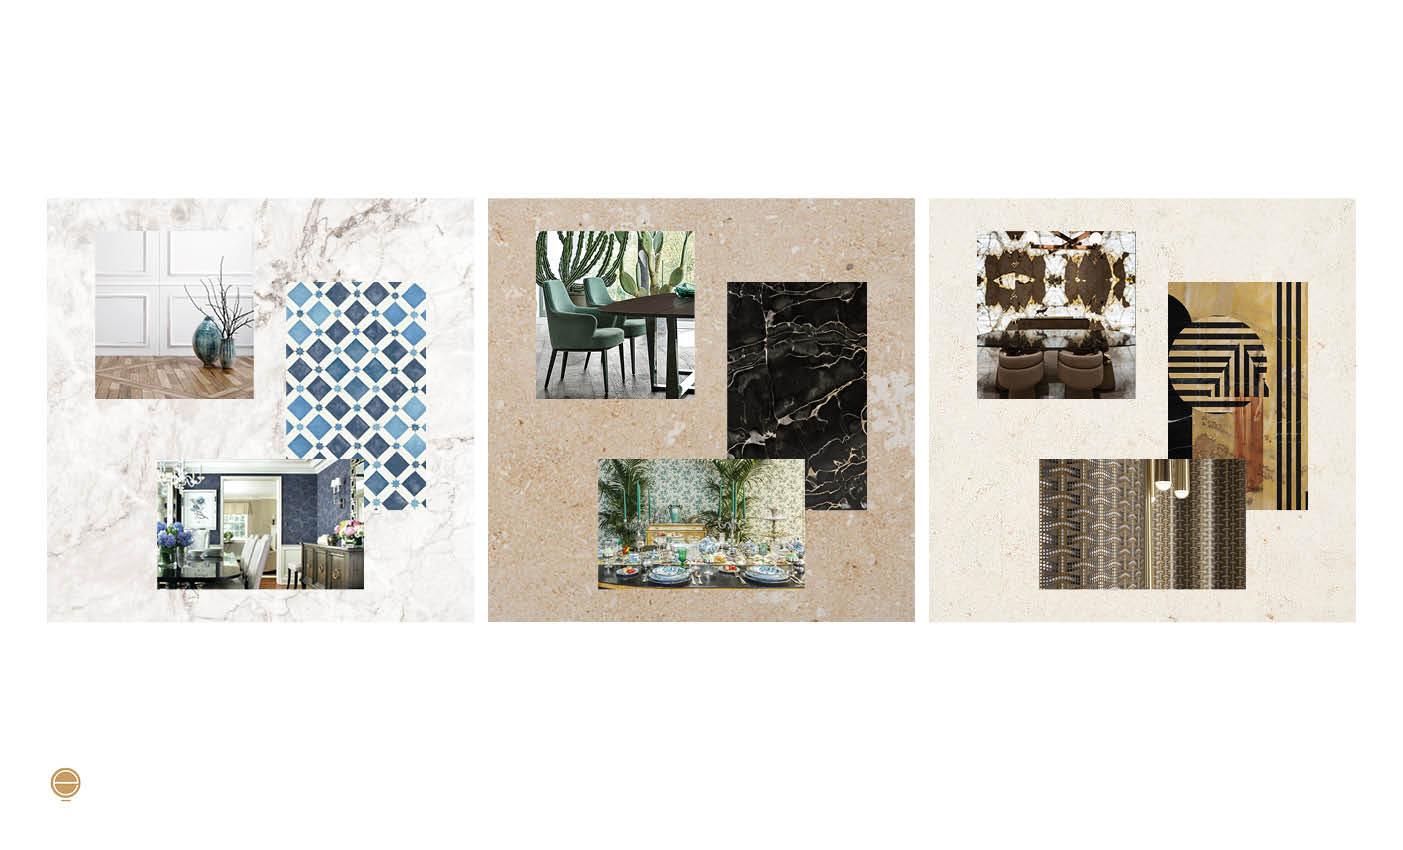 luxury dining room design concept made by Esperiri Milano